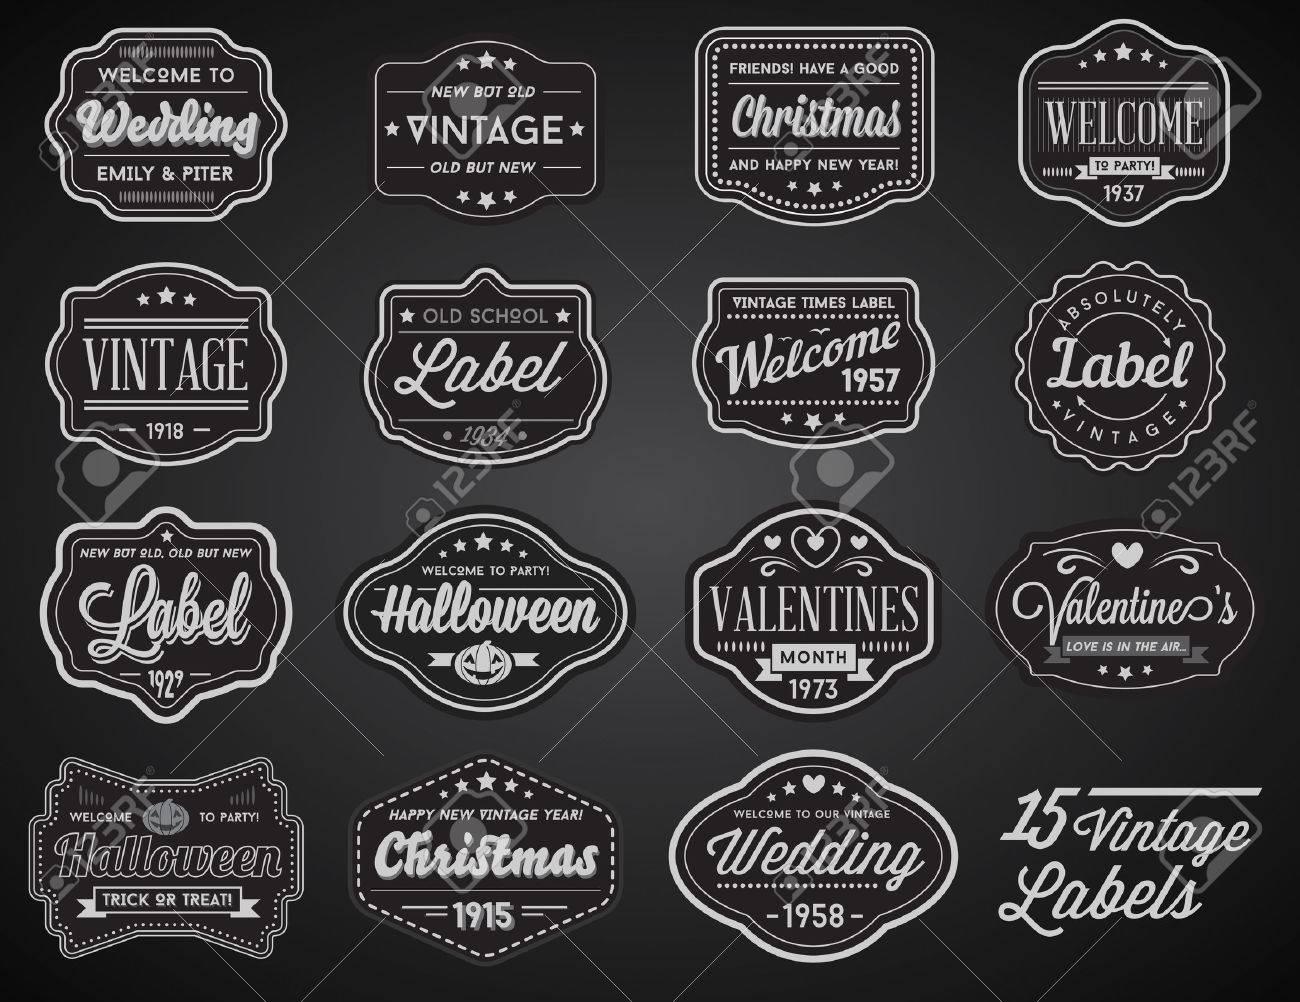 Vector Set of Vintage Retro Styled Premium Design Labels - 53371578